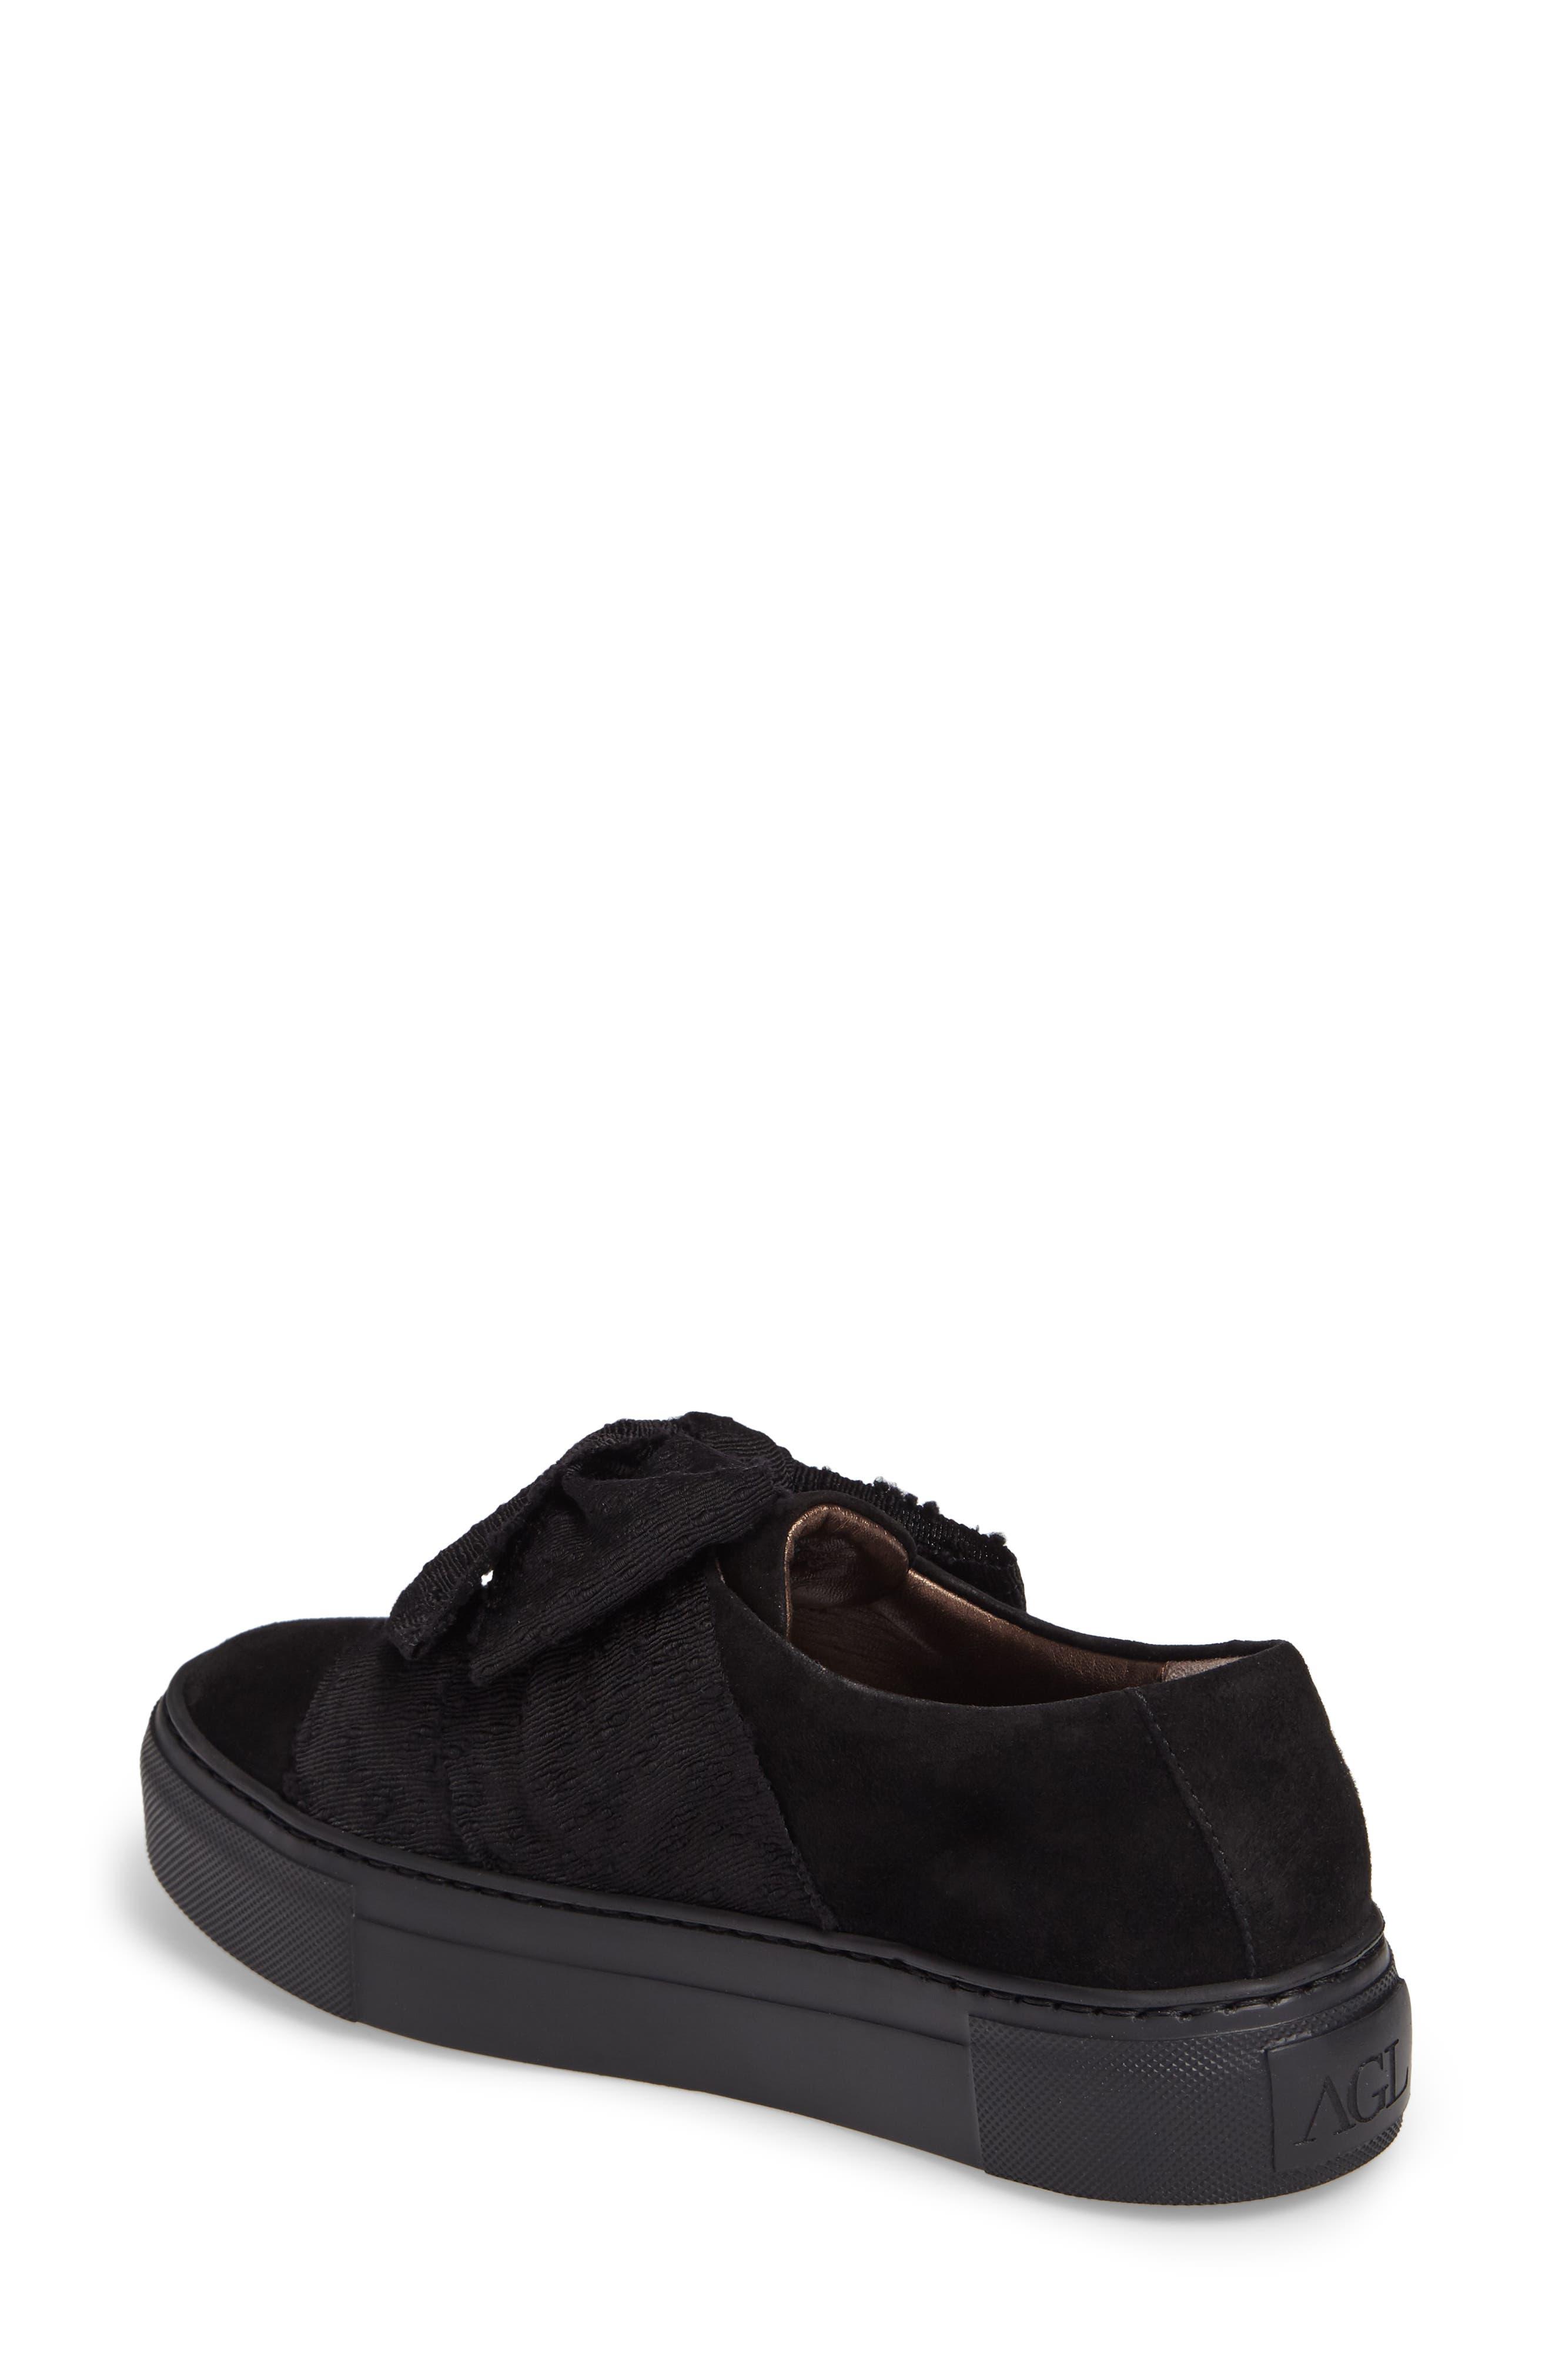 Bow Platform Sneaker,                             Alternate thumbnail 2, color,                             002